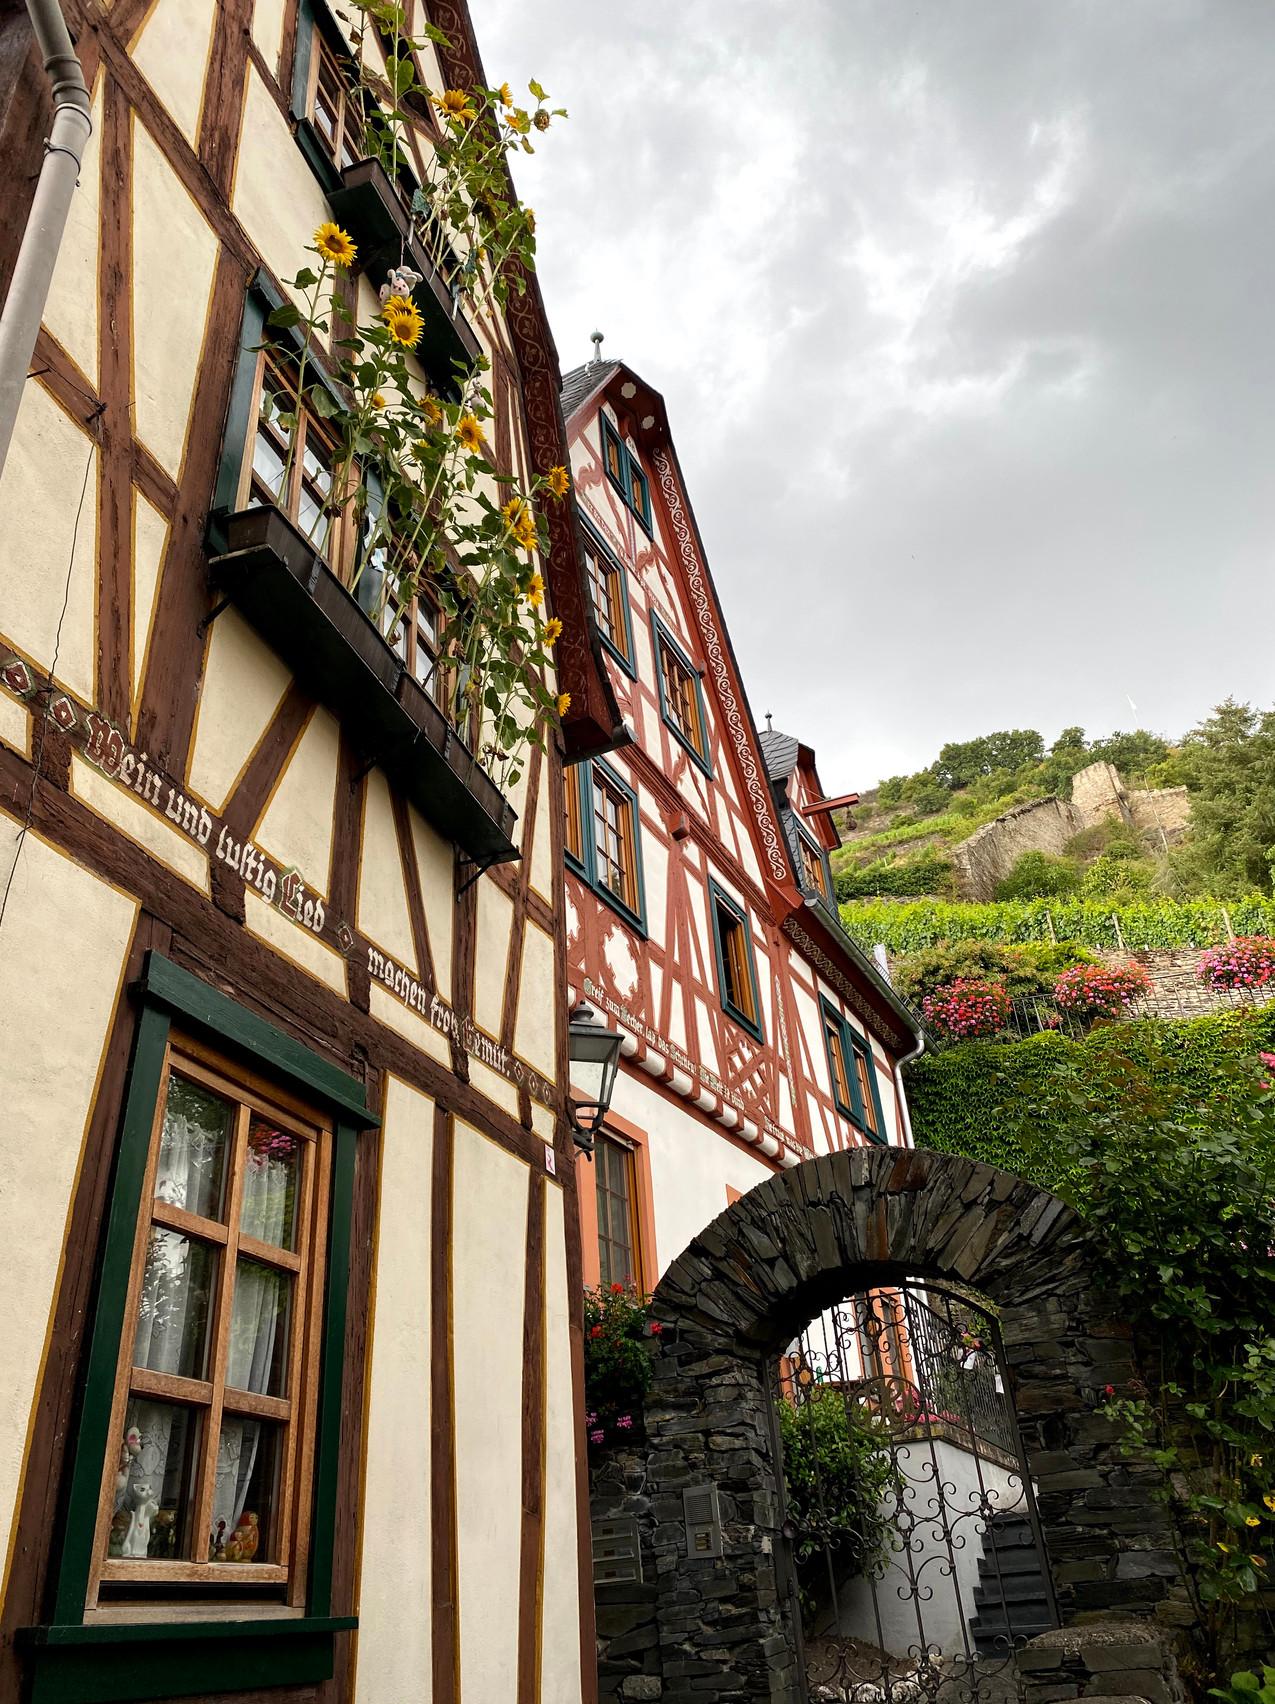 Bacharach, Duitsland